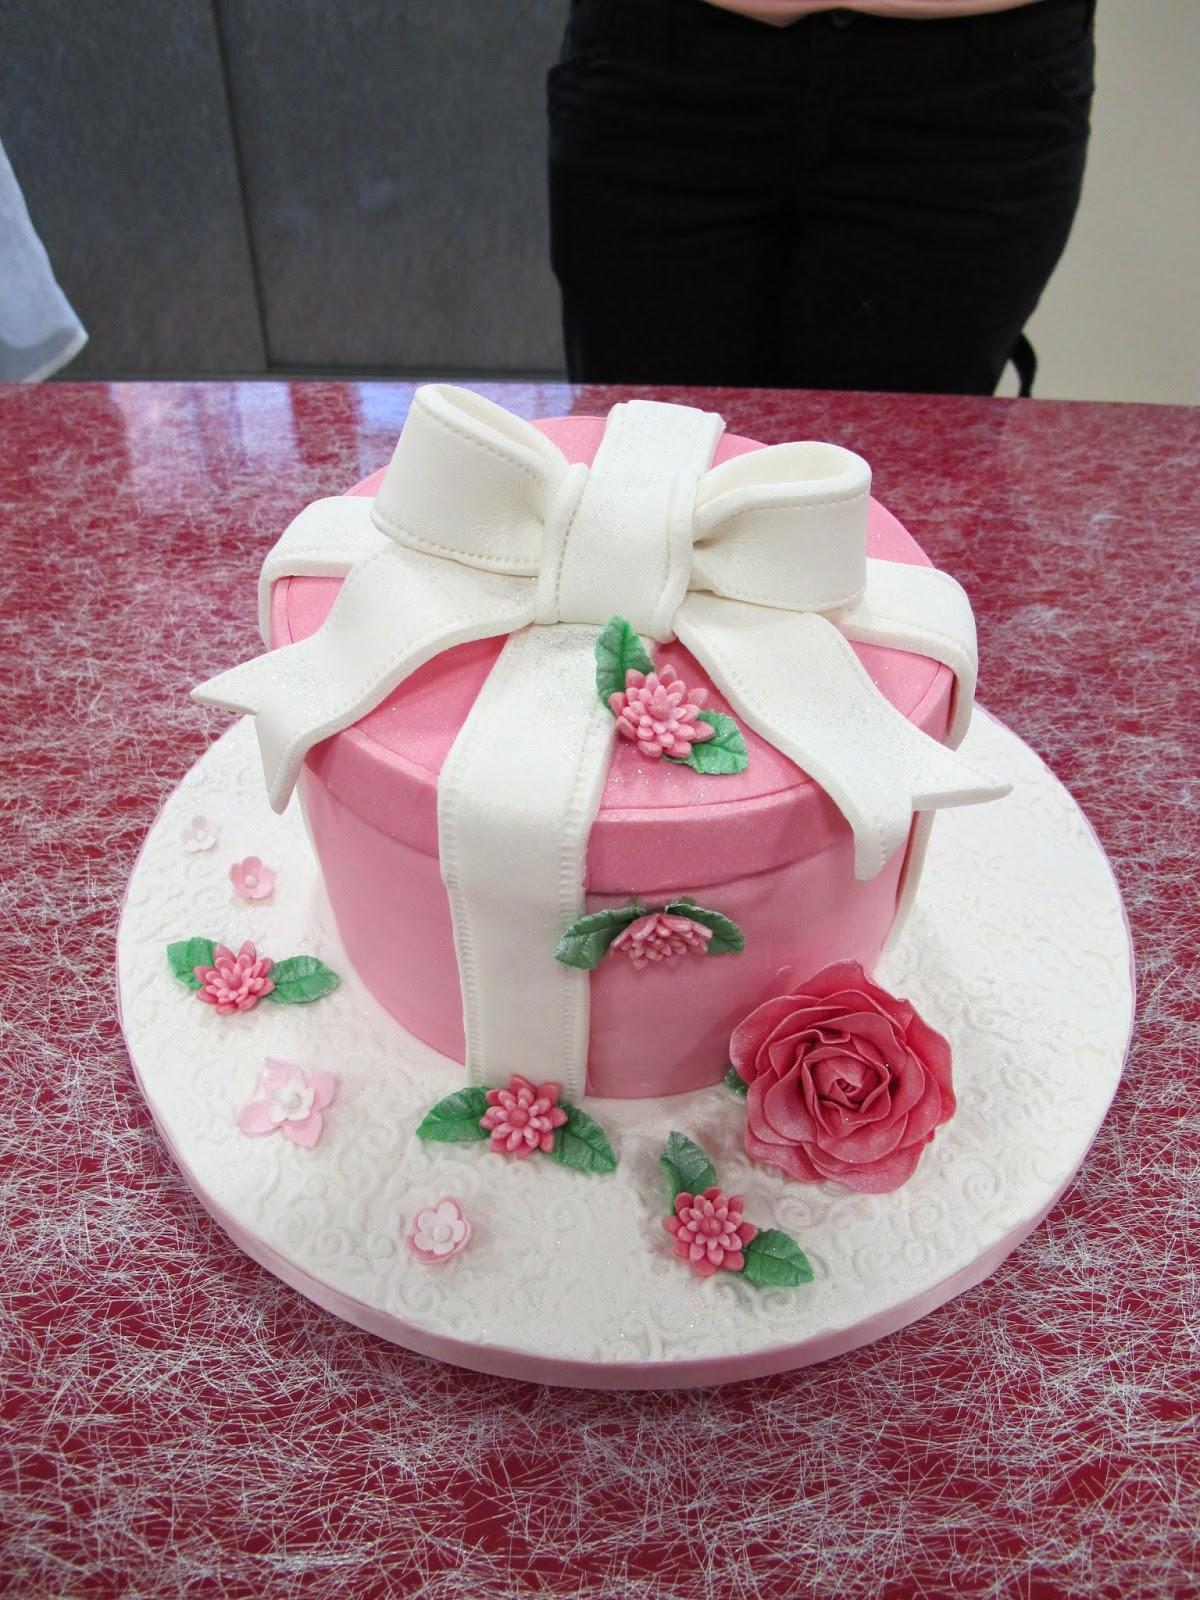 Crazy cake cake design thionville metz luxembourg crazy cake academy - Boutique orange thionville ...